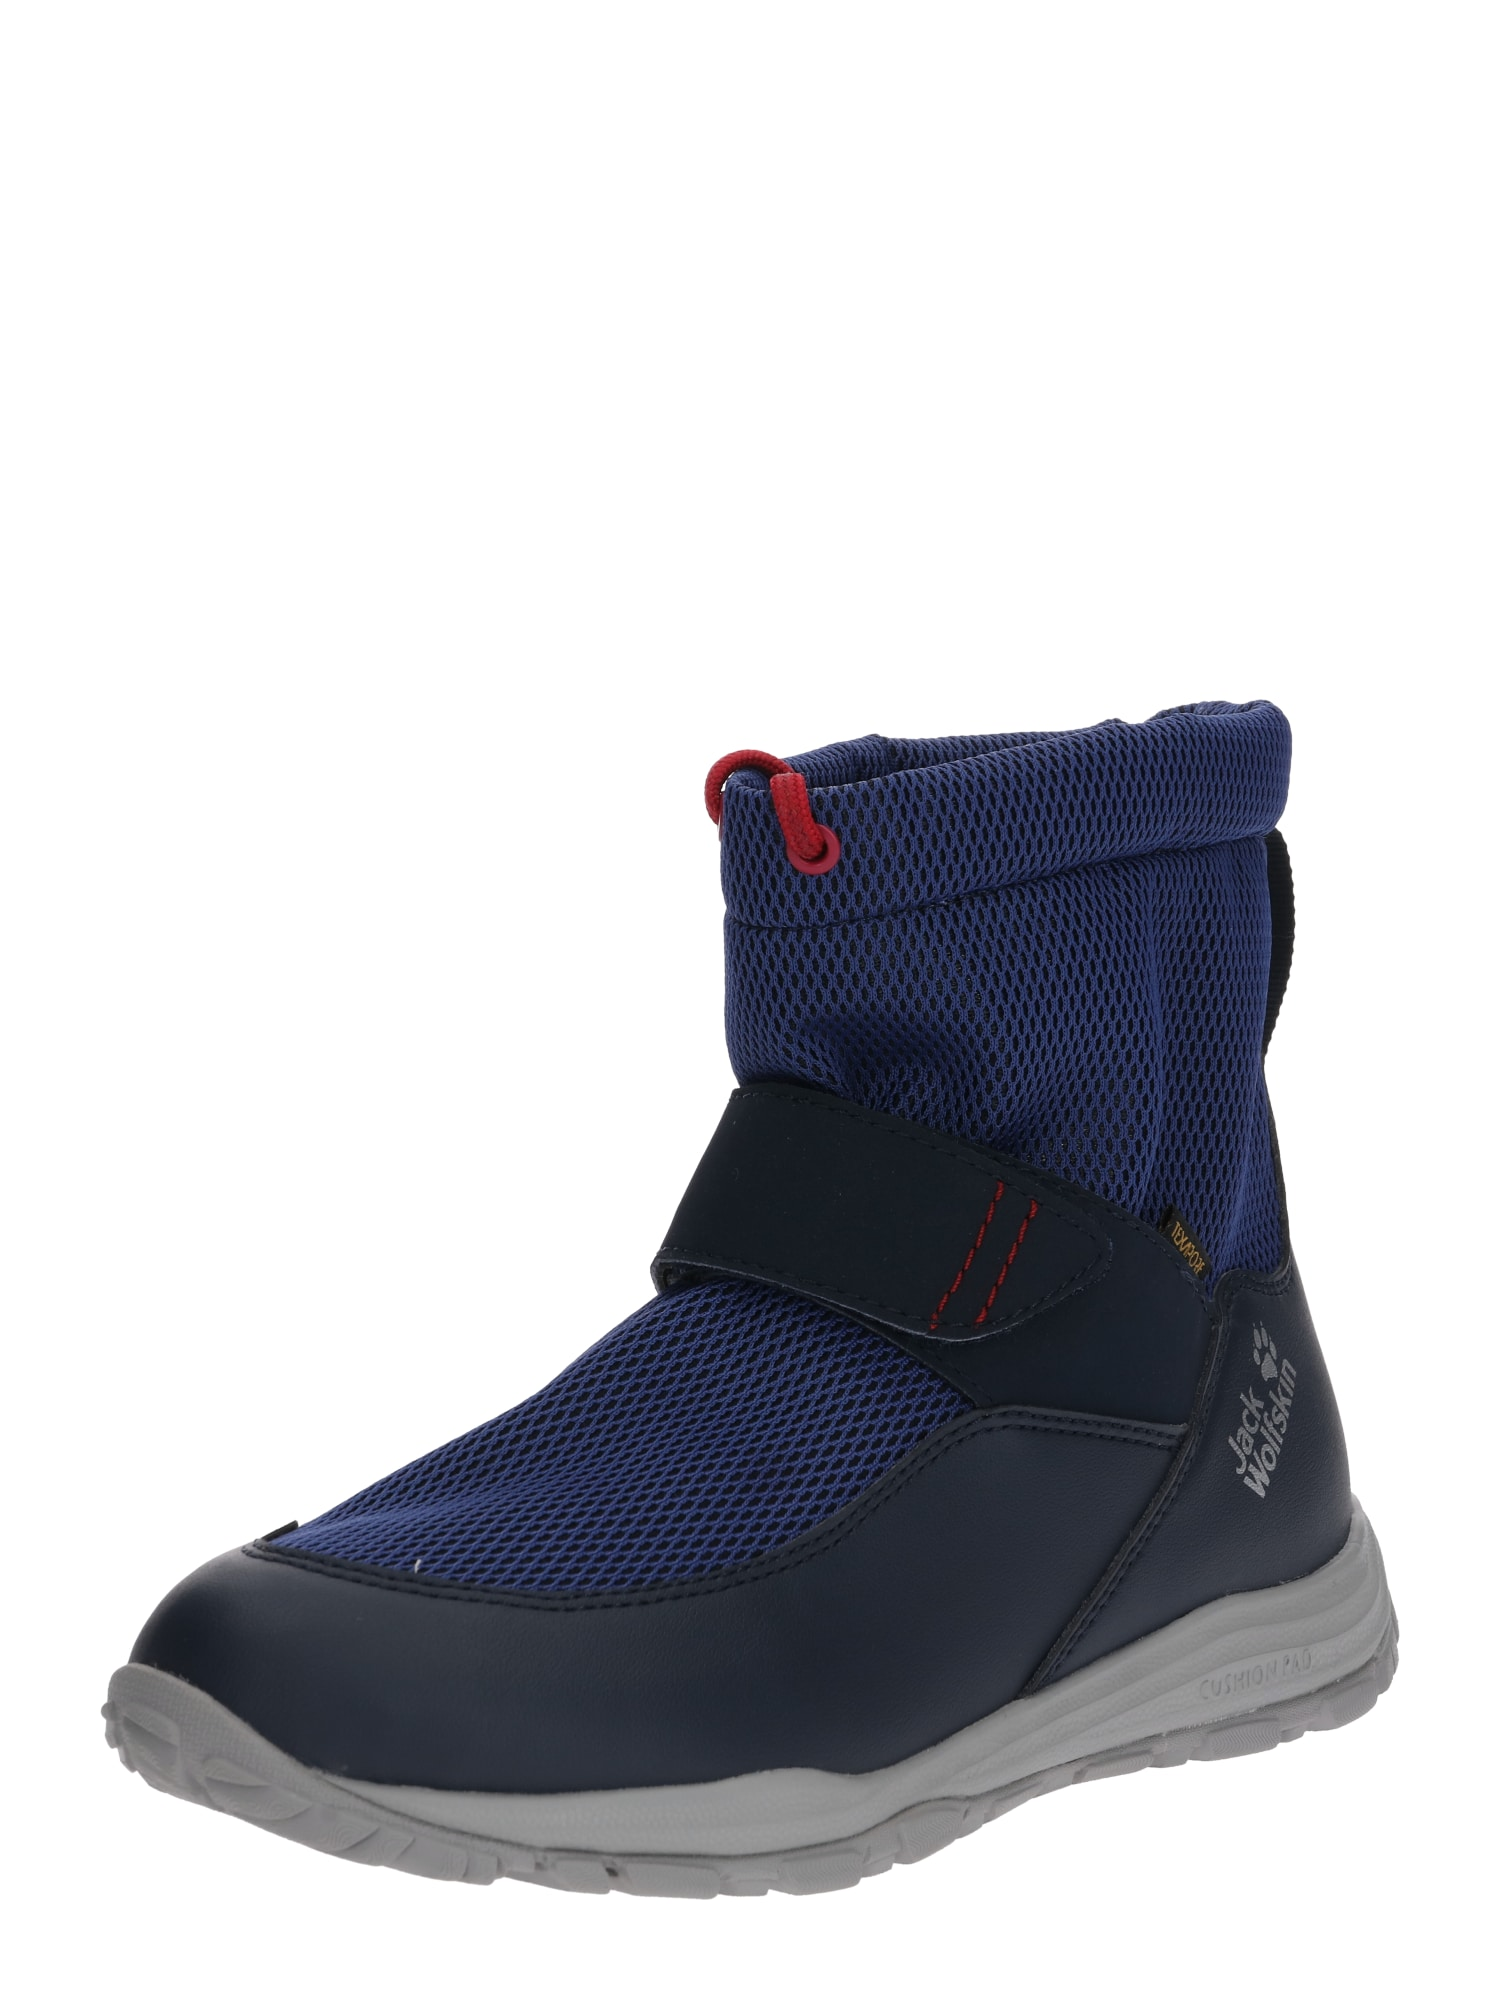 JACK WOLFSKIN Sportiniai batai 'KIWI WT TEXAPORE MID K' tamsiai mėlyna